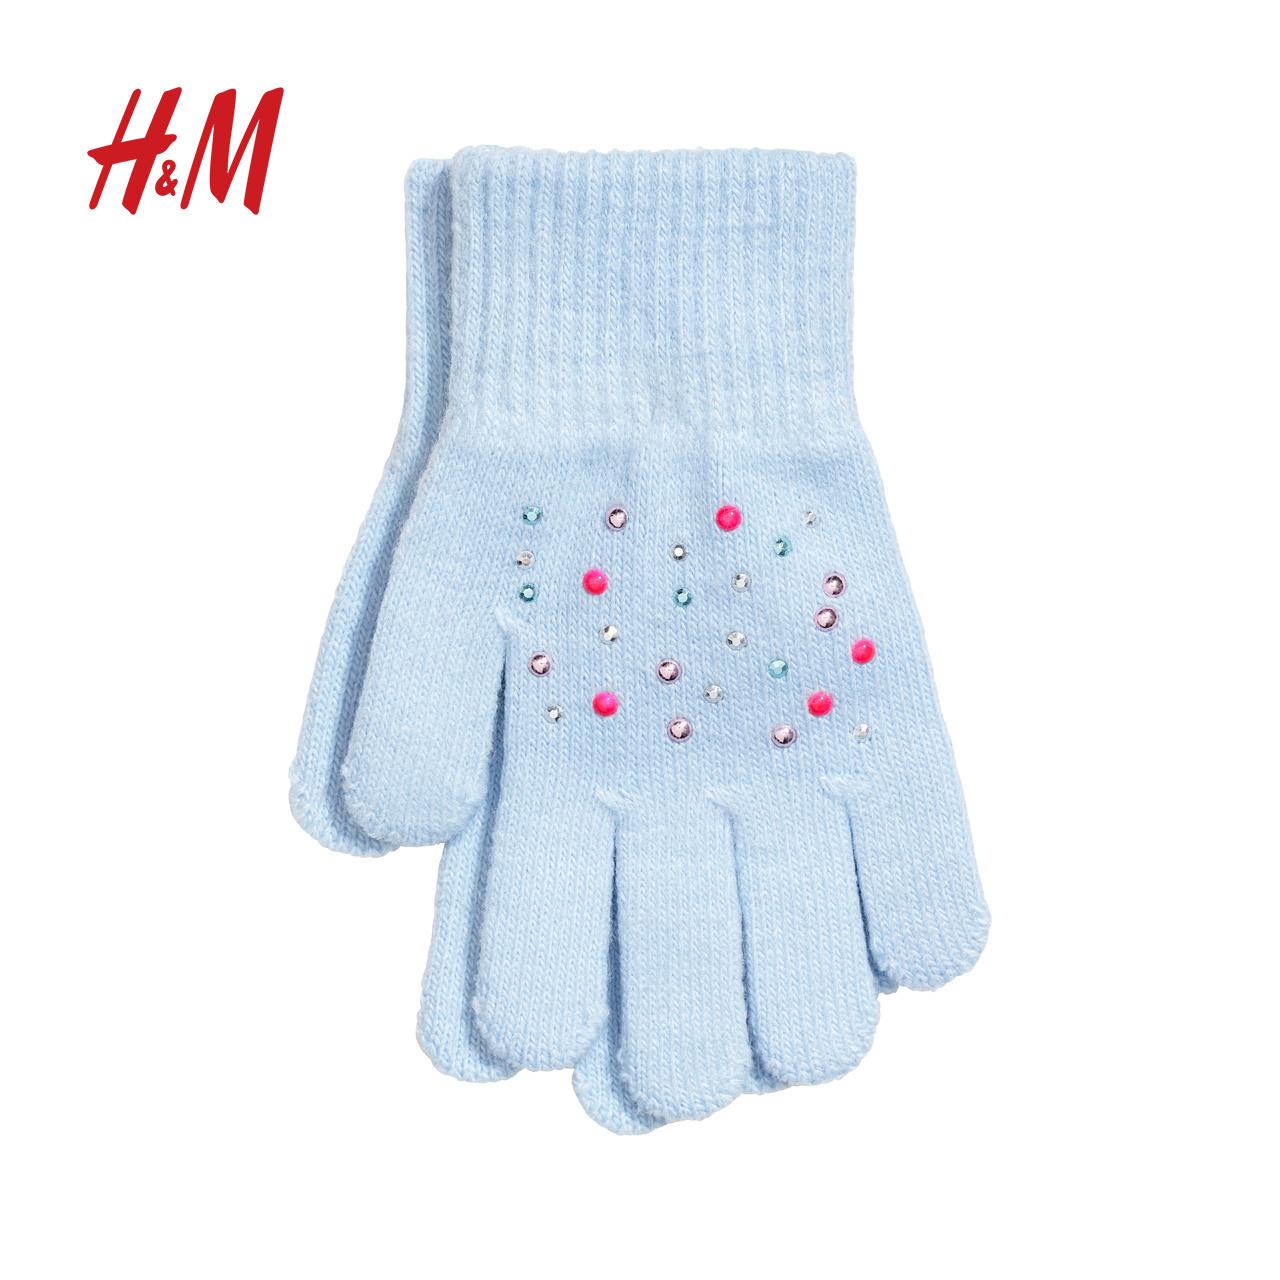 Н & М ребятишки девочки очки перчатки HM0550415